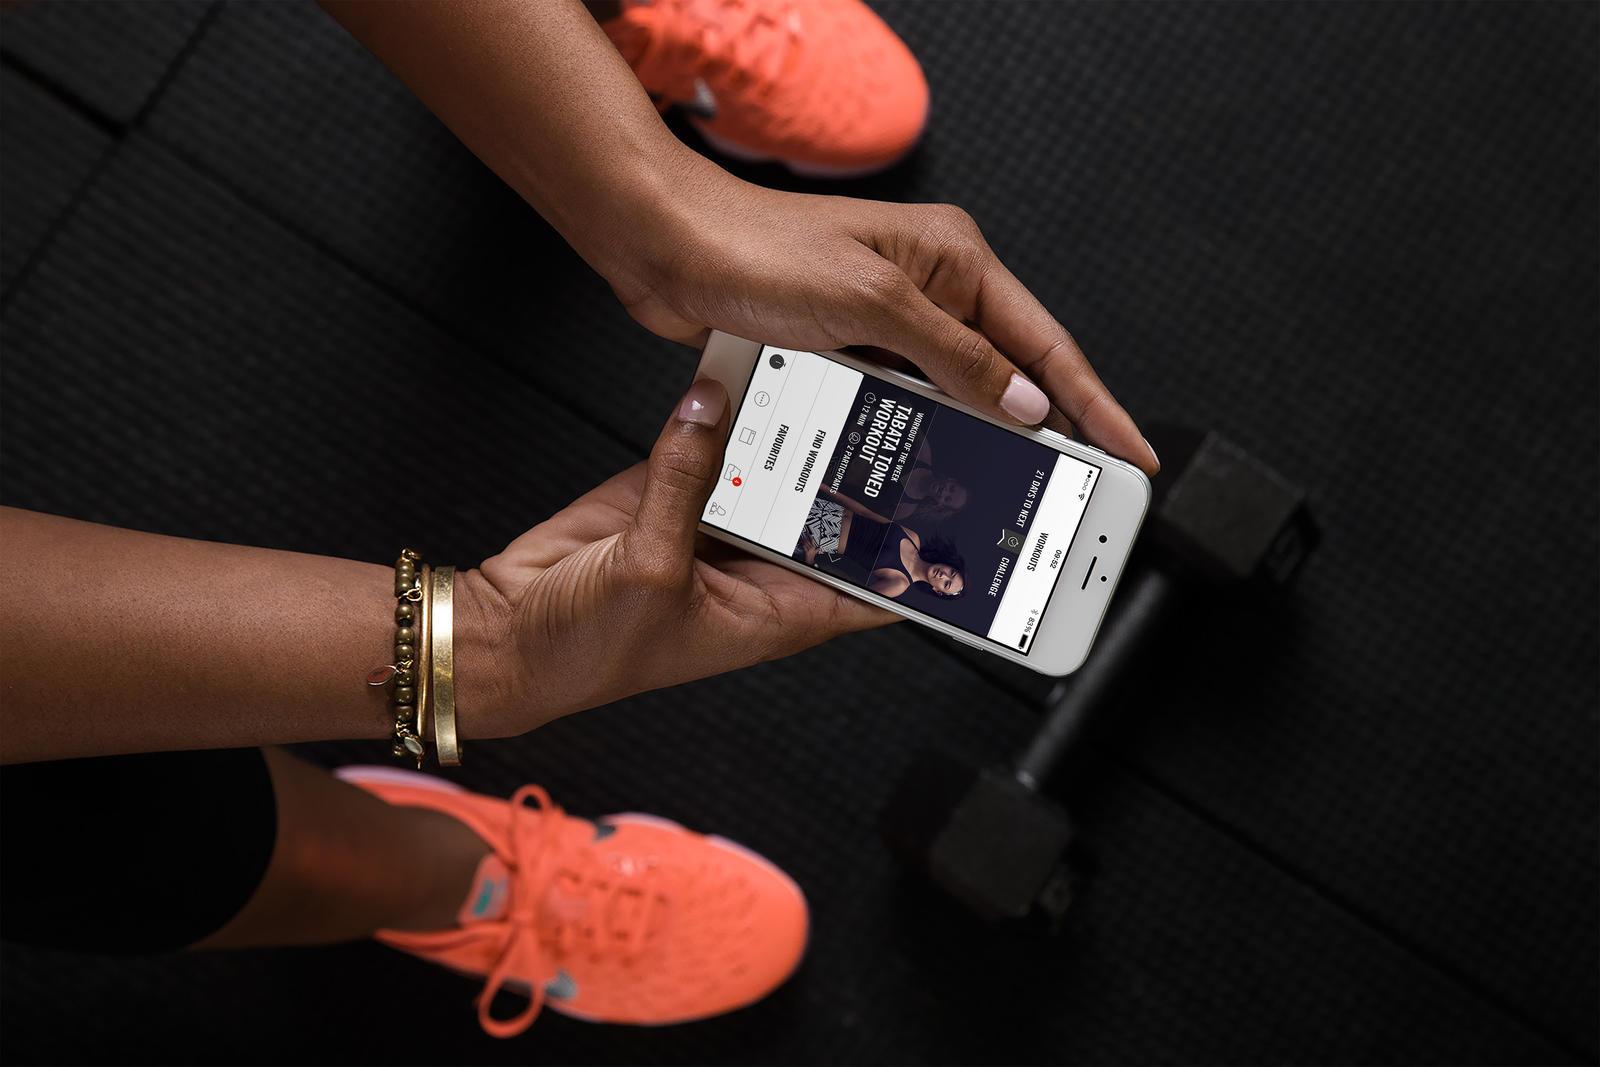 Wallpaper Tennis Girl New Nike Training Club App Update Inspires Athletes For